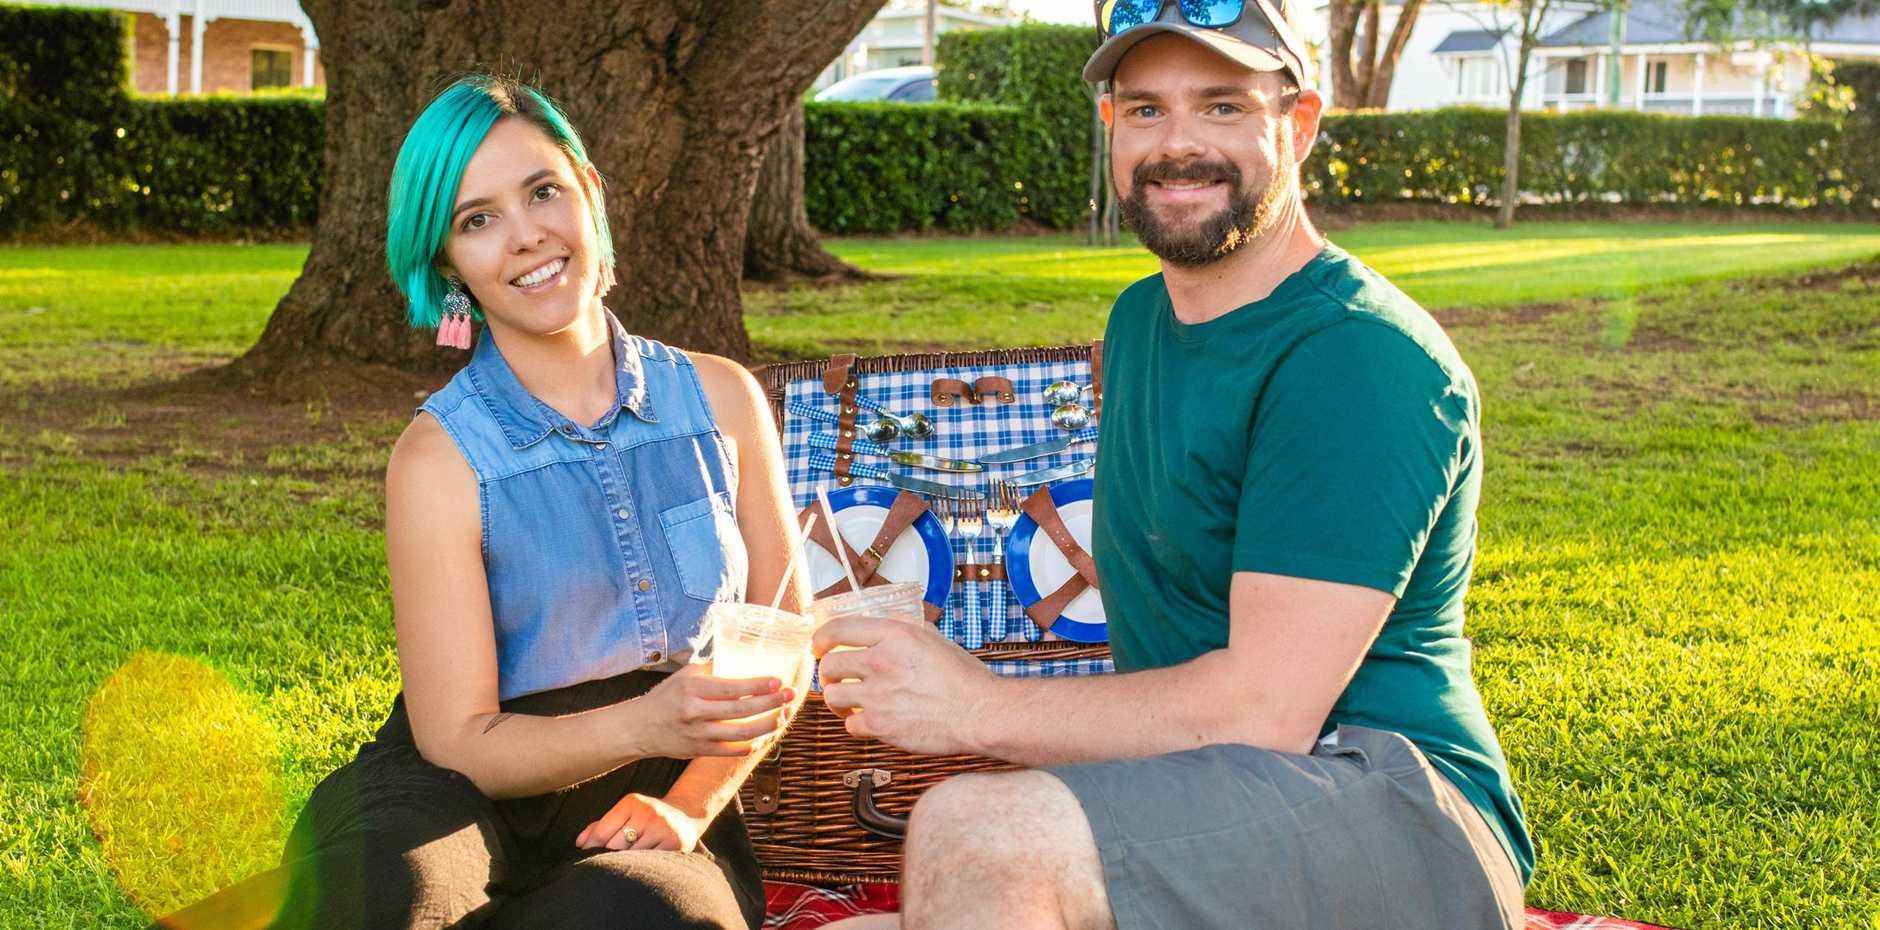 Tim Swinson and Aleisha Cowan enjoy a picnic in Laurel Bank Park.